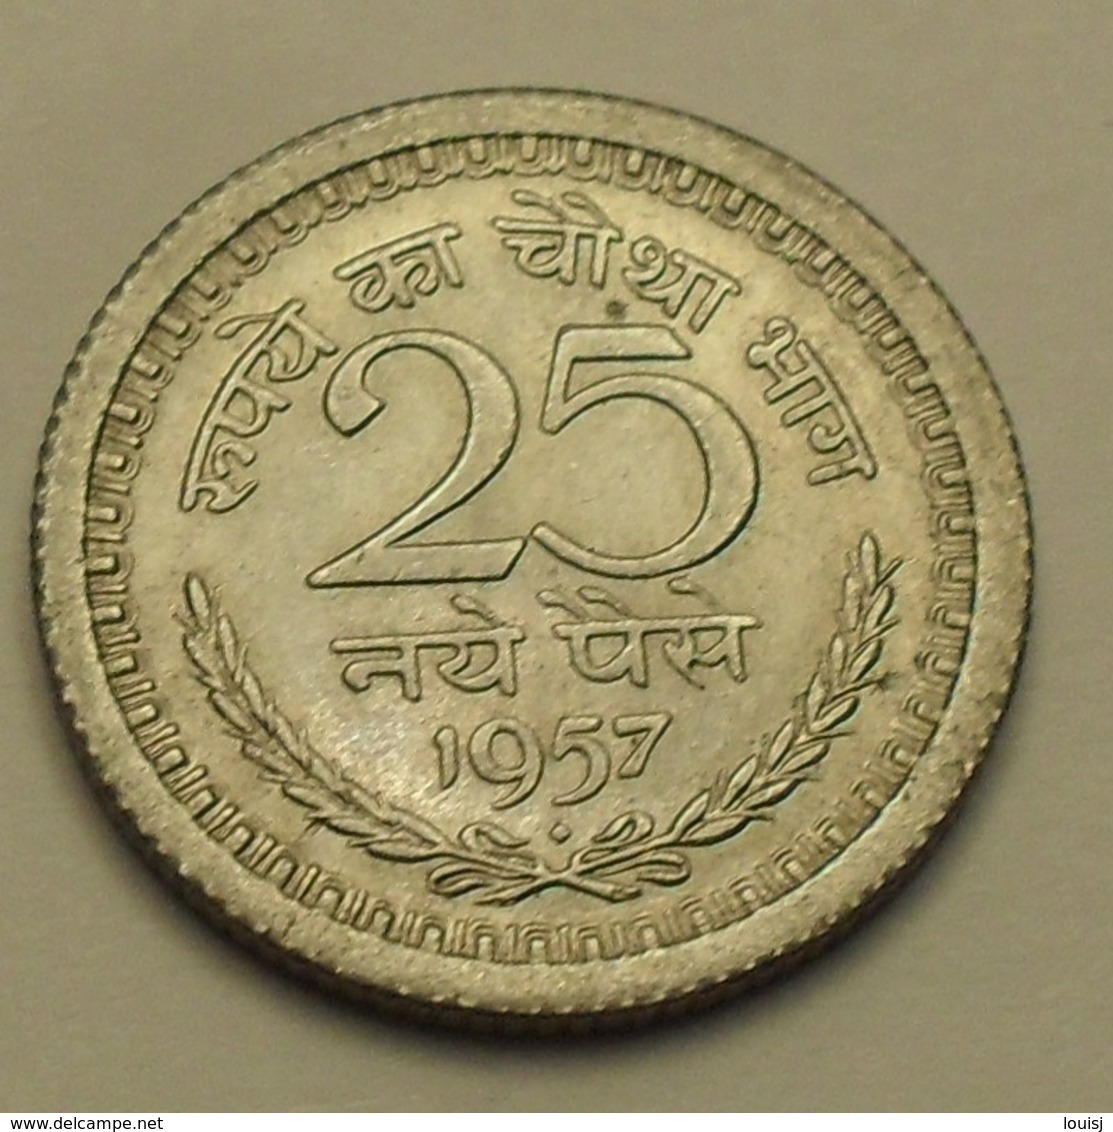 1957 - Inde République - India Republic - 25 NAYE PAISE, Mumbai Mint, KM 47.1 - Inde